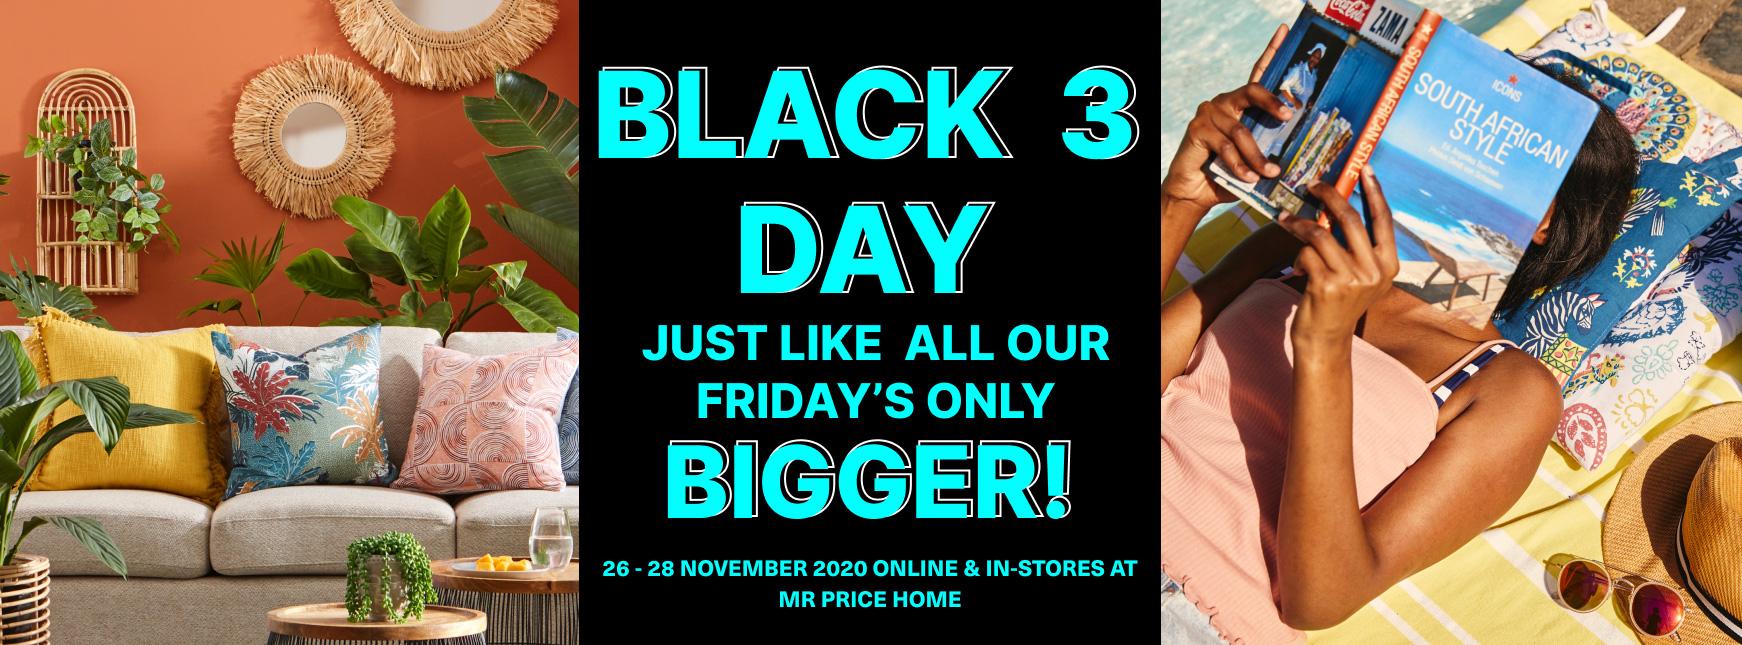 Black Friday 2020 Deals Homeware Specials Mr Price Home